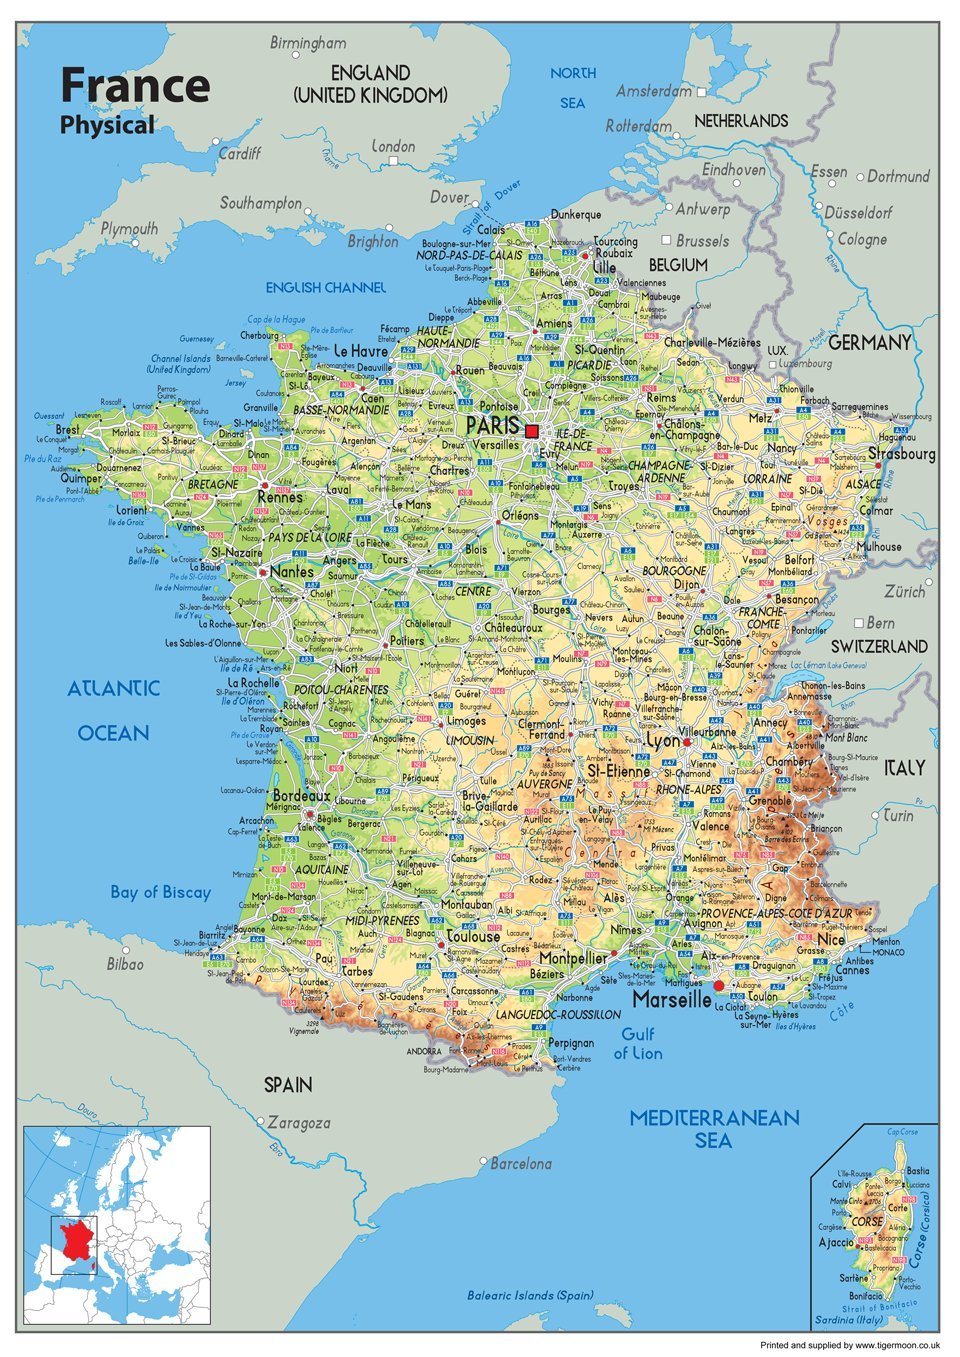 /A0/Gr/ö/ße 84.1/x 118.9/cm Frankreich Physikalische Karte/ /Papier laminiert/